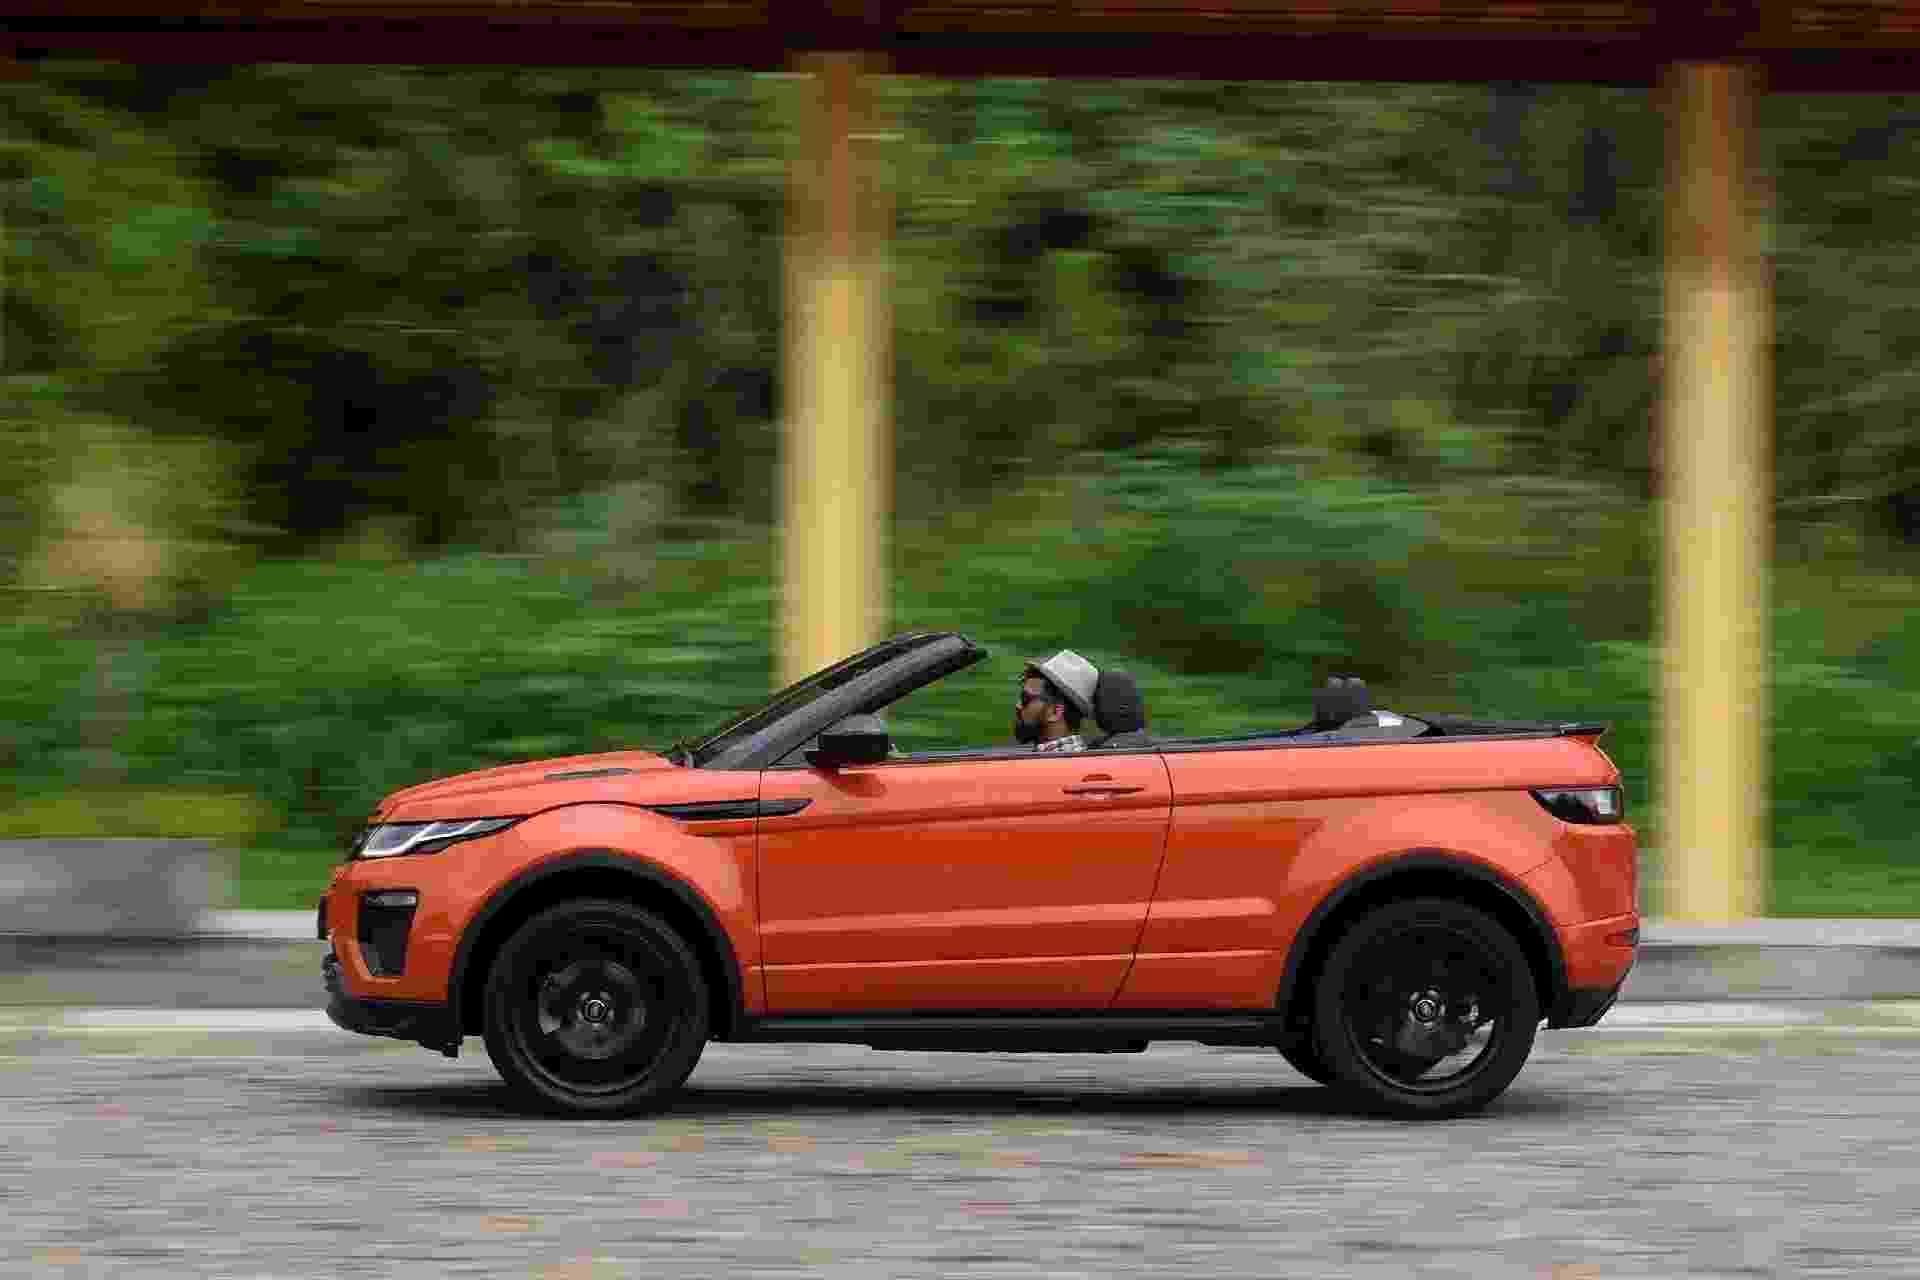 Range Rover Evoque Cabrio - Murilo Góes/UOL